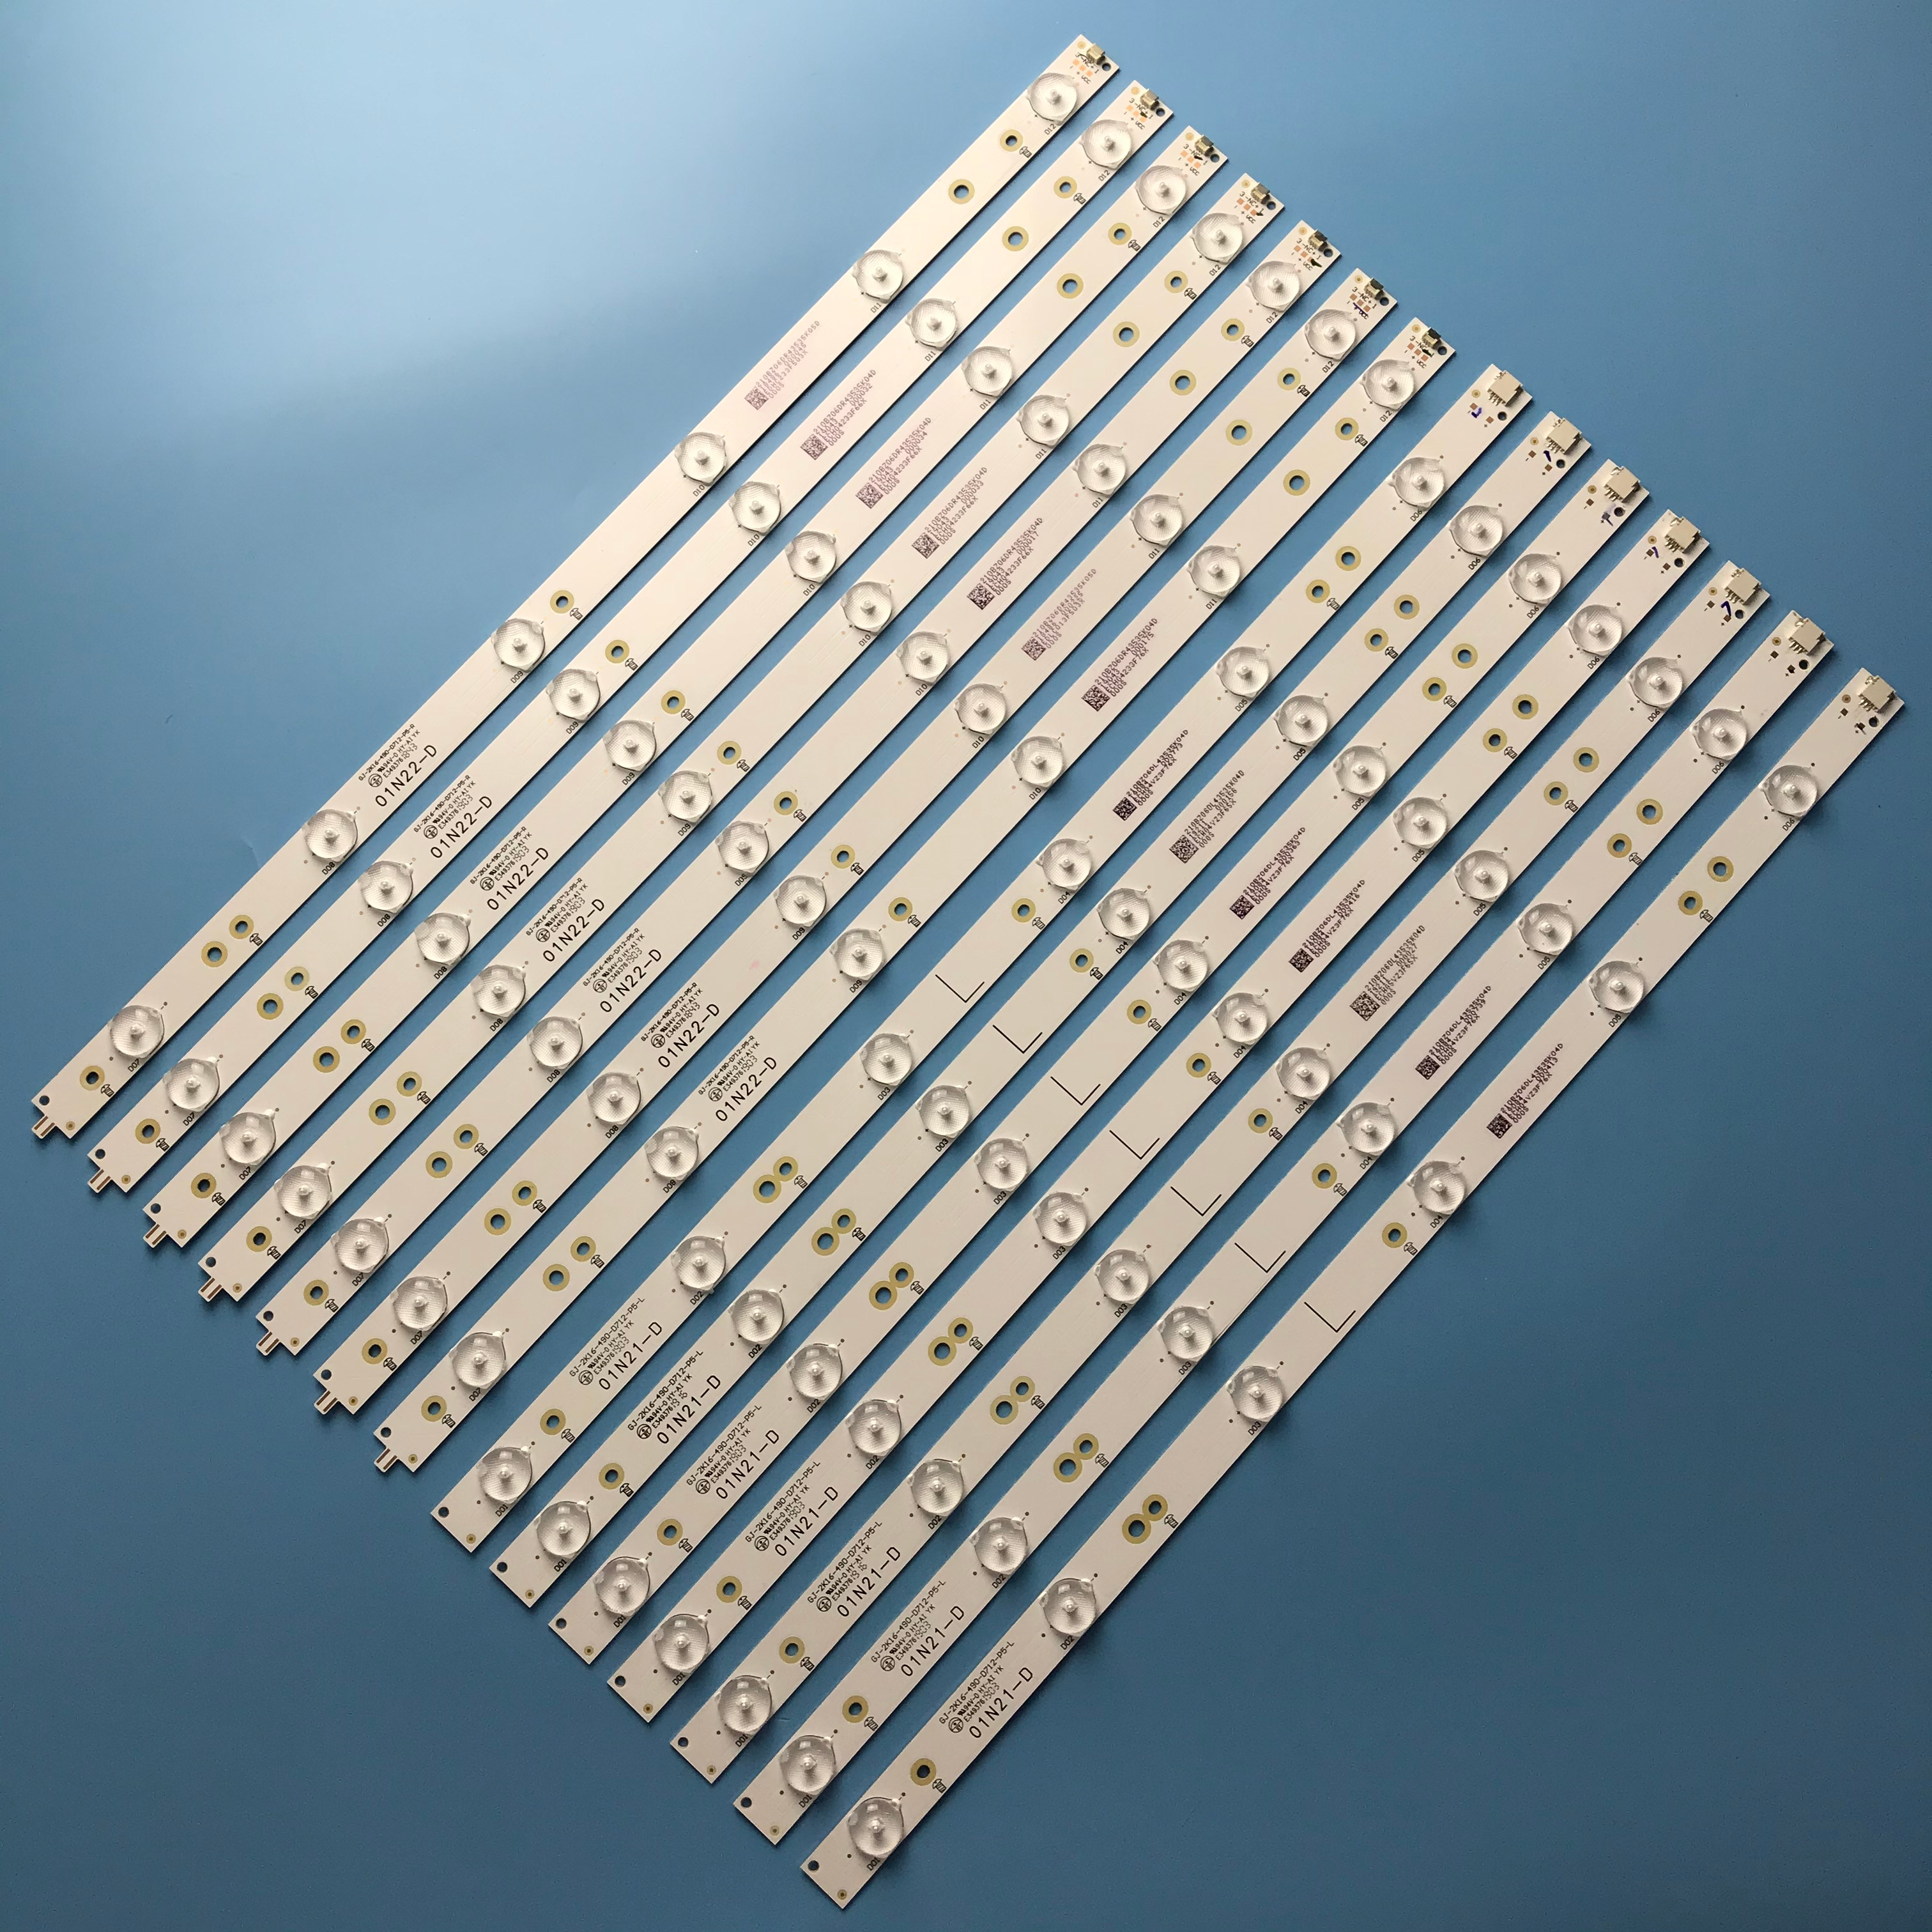 LED الخلفية قطاع 6 + 6 المصابيح GJ-2K16-490-D712-P5-L + R ل فيليبس 49 '49PUS6401 49PUS6501 49PUH6101 49PUS6561/12 49PUS6101/12